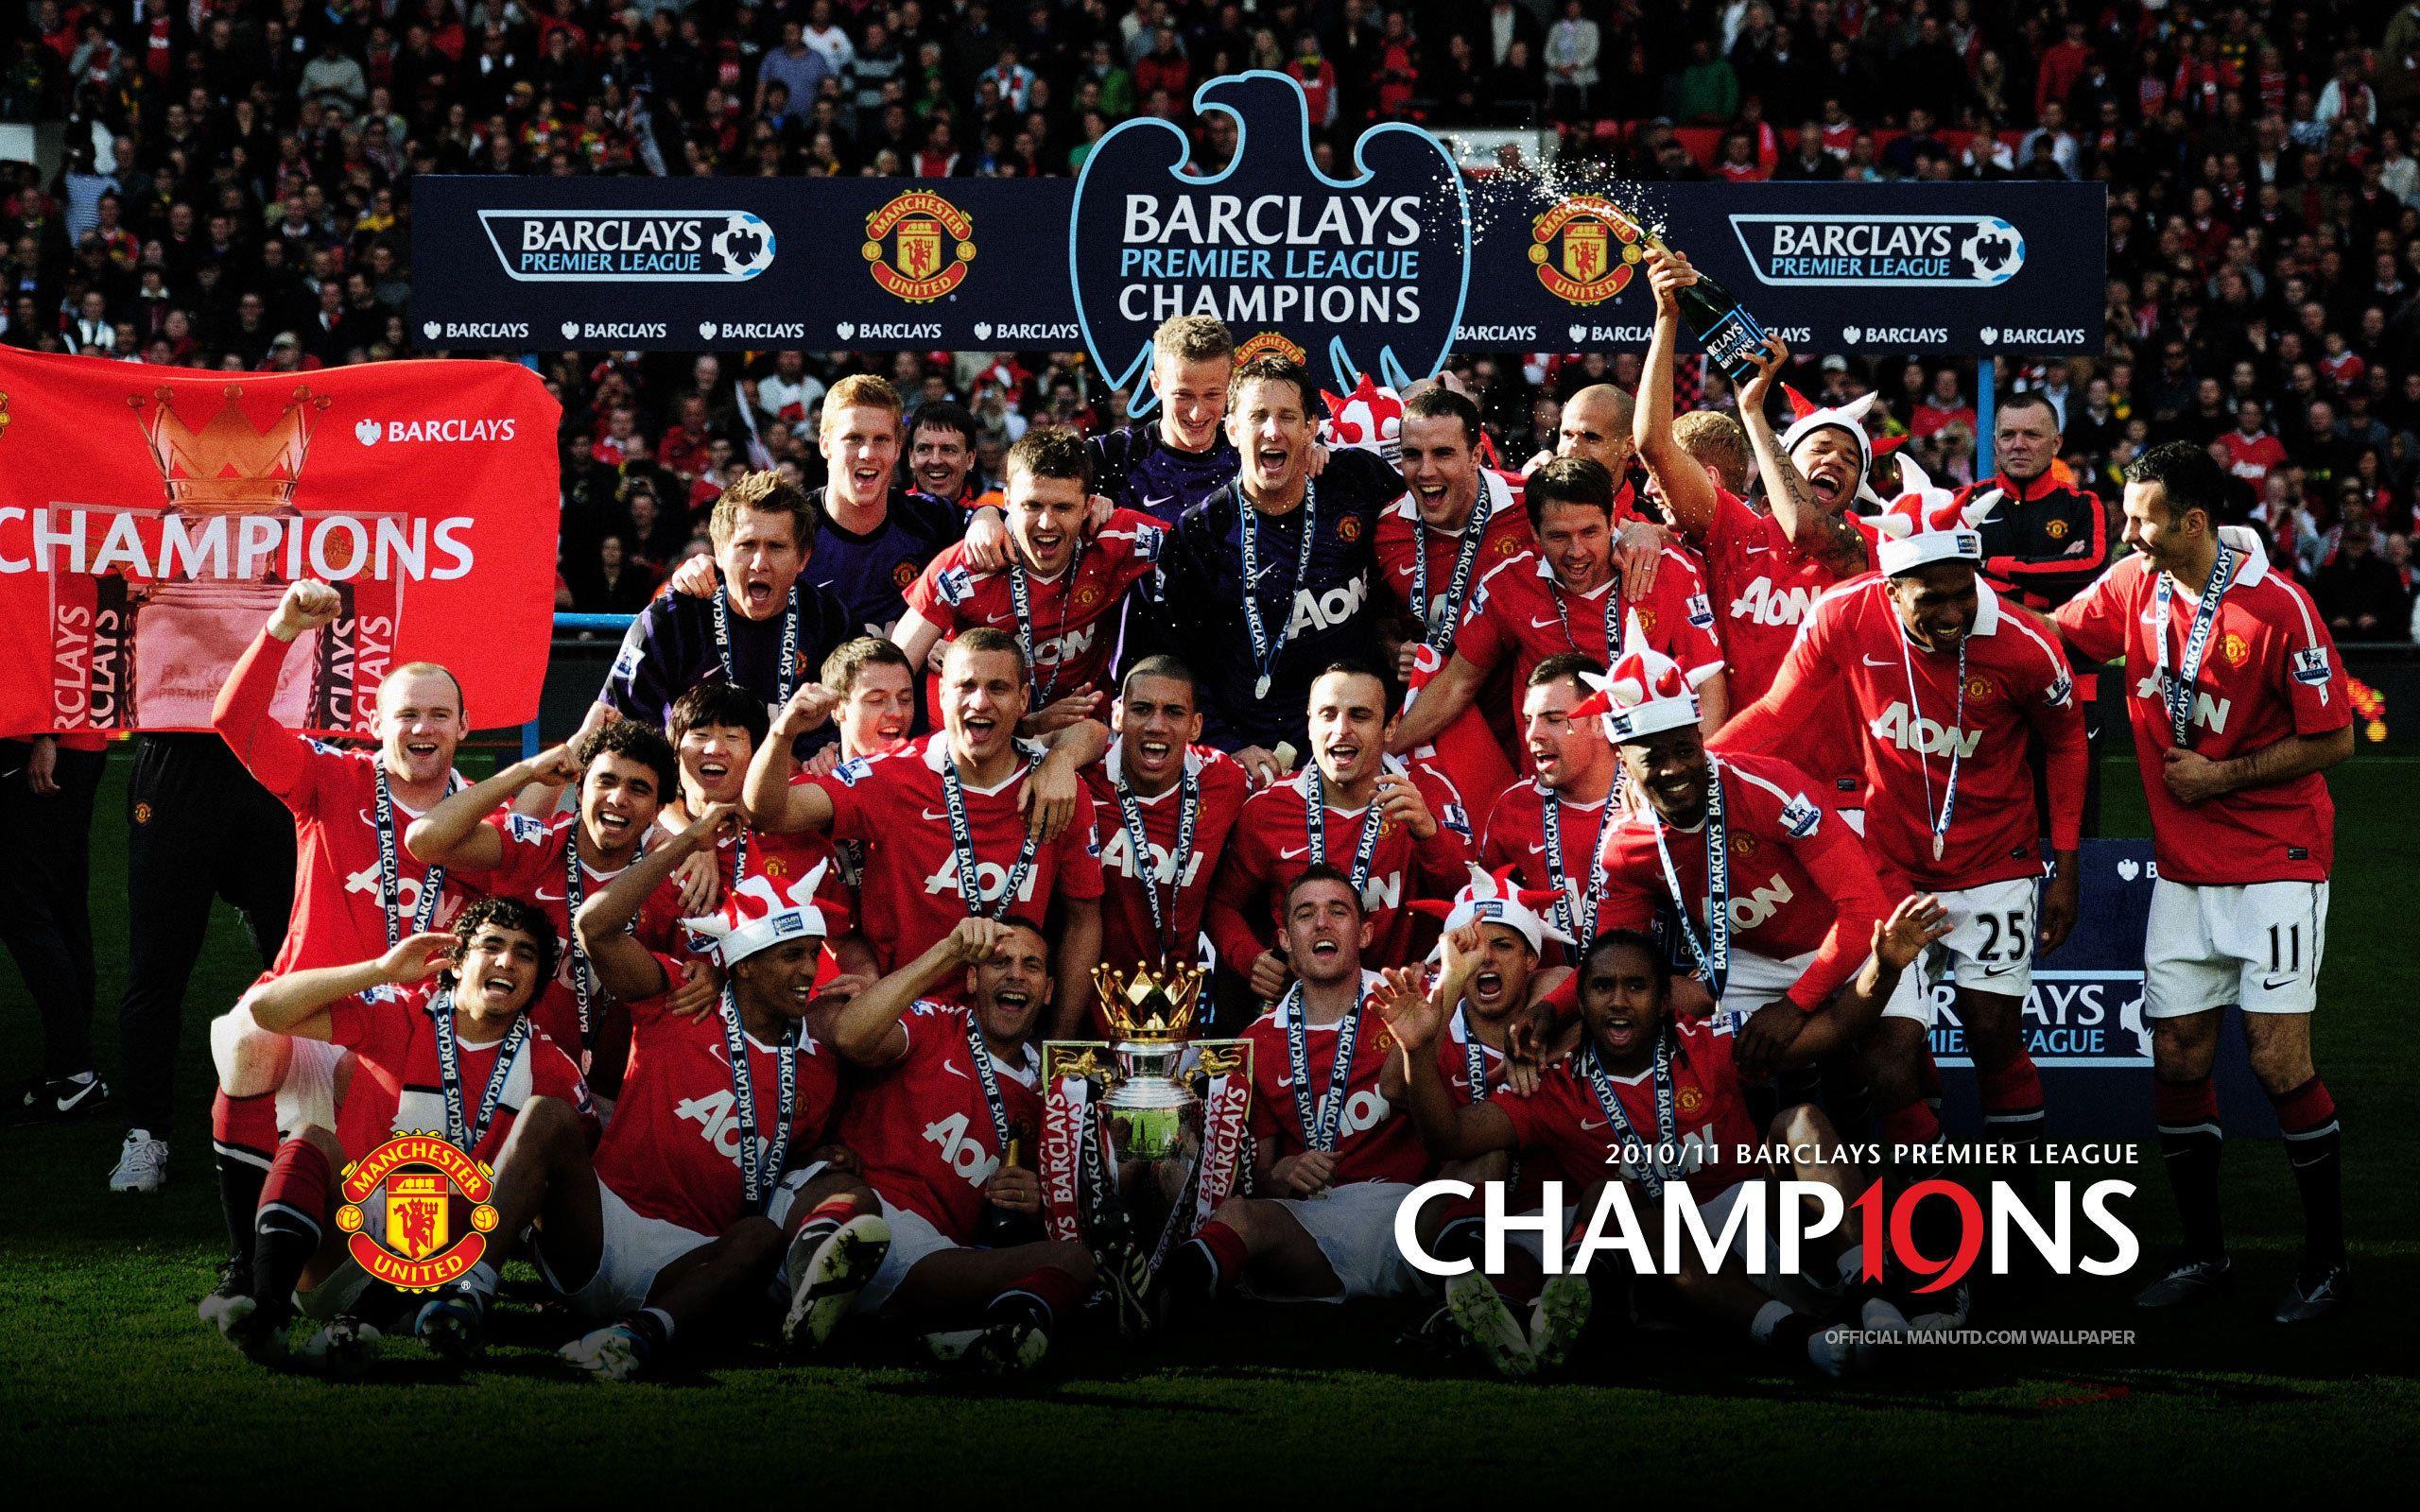 sports teams desktop wallpaper 2560x1600